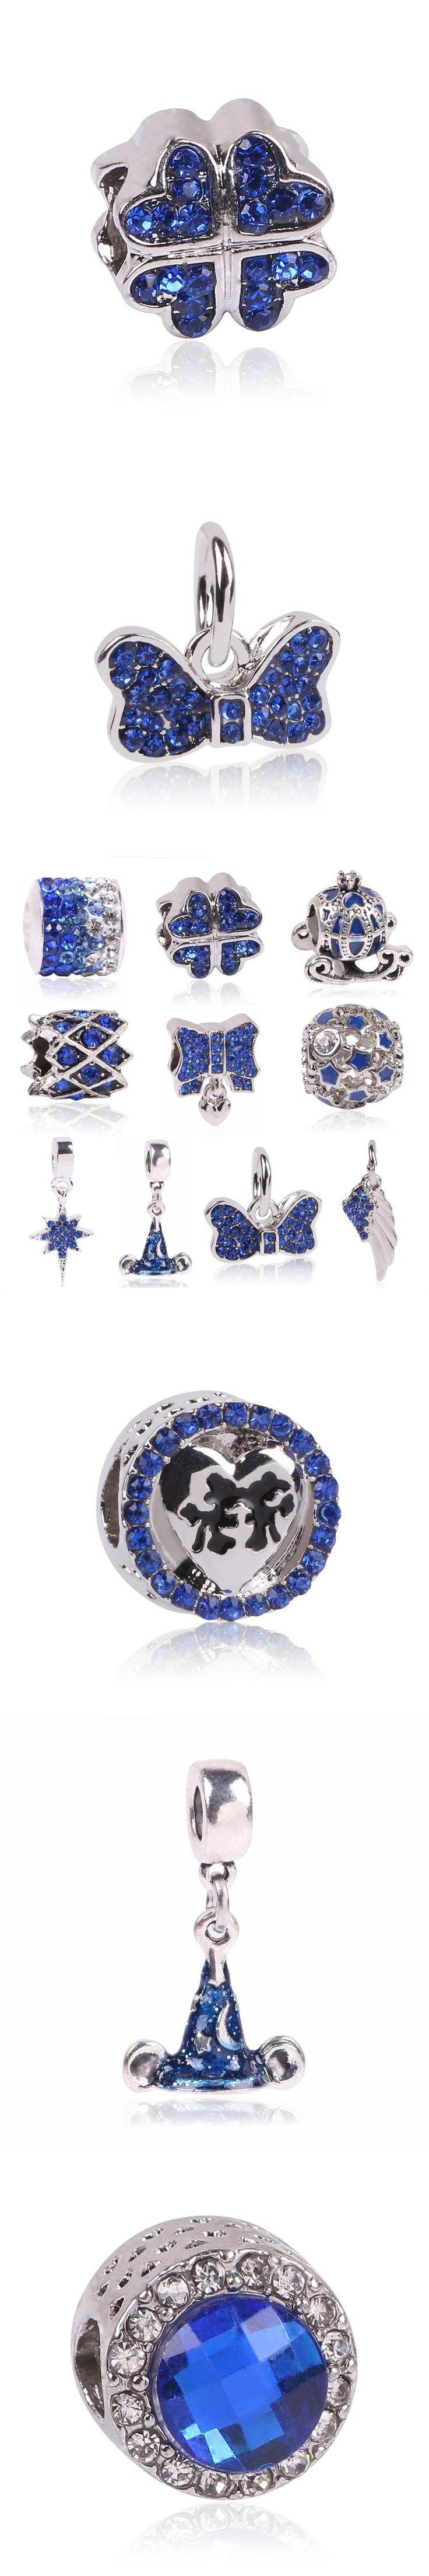 2017 Hot Sale Plated Silver Blue Enamel Charm Bead Fit Original Pandora Beads Bracelet Necklace Authentic Fashion Jewelry